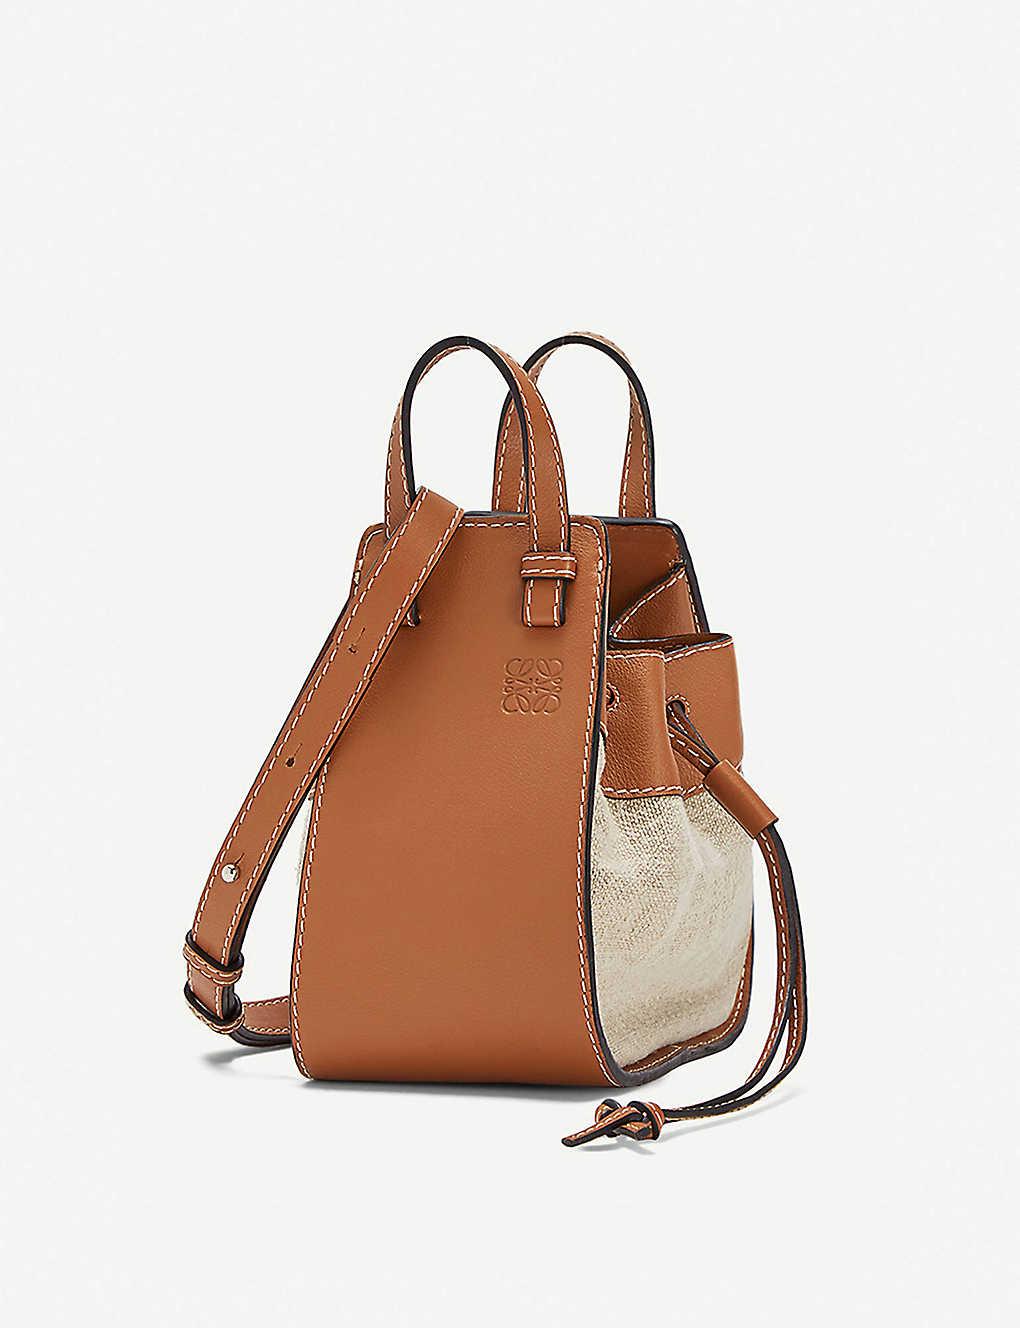 decc4c250de2 LOEWE - Hammock mini leather and canvas shoulder bag